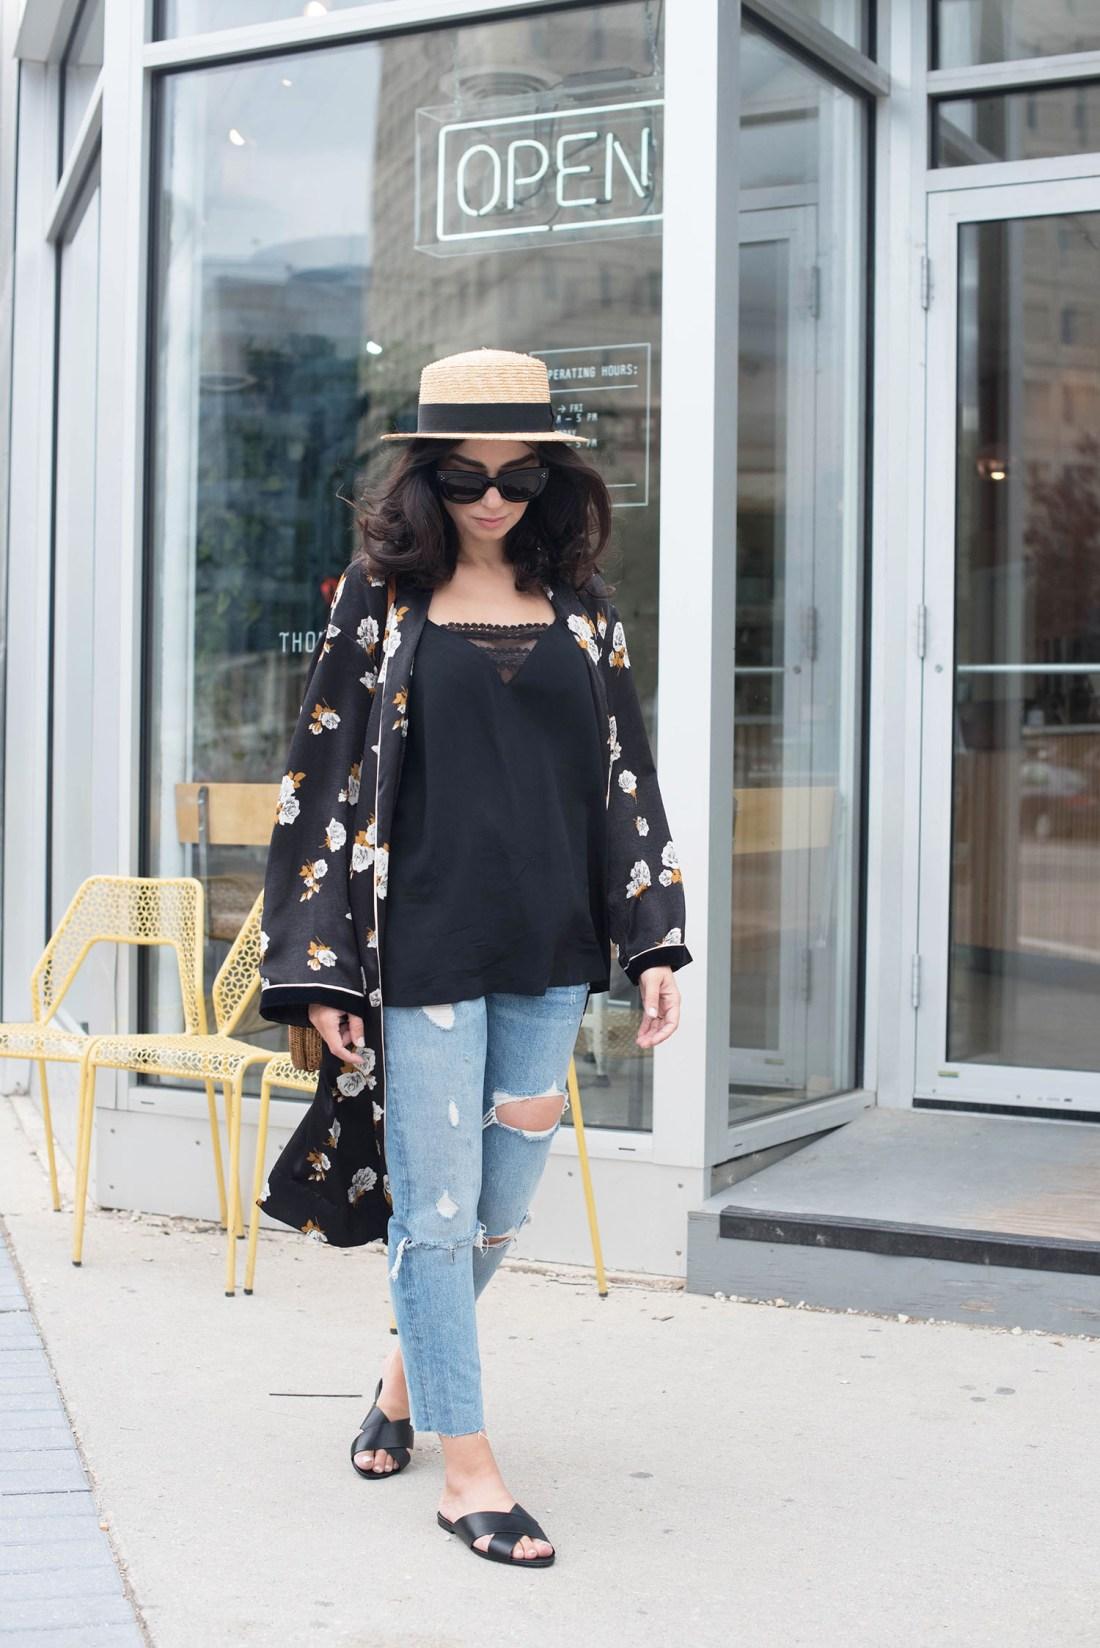 Winnipeg fashion blogger Cee Fardoe of Coco & Vera walks in front of Thom Bargen coffee shop wearing a Zara floral kimono and Grlfrnd Karolina jeans